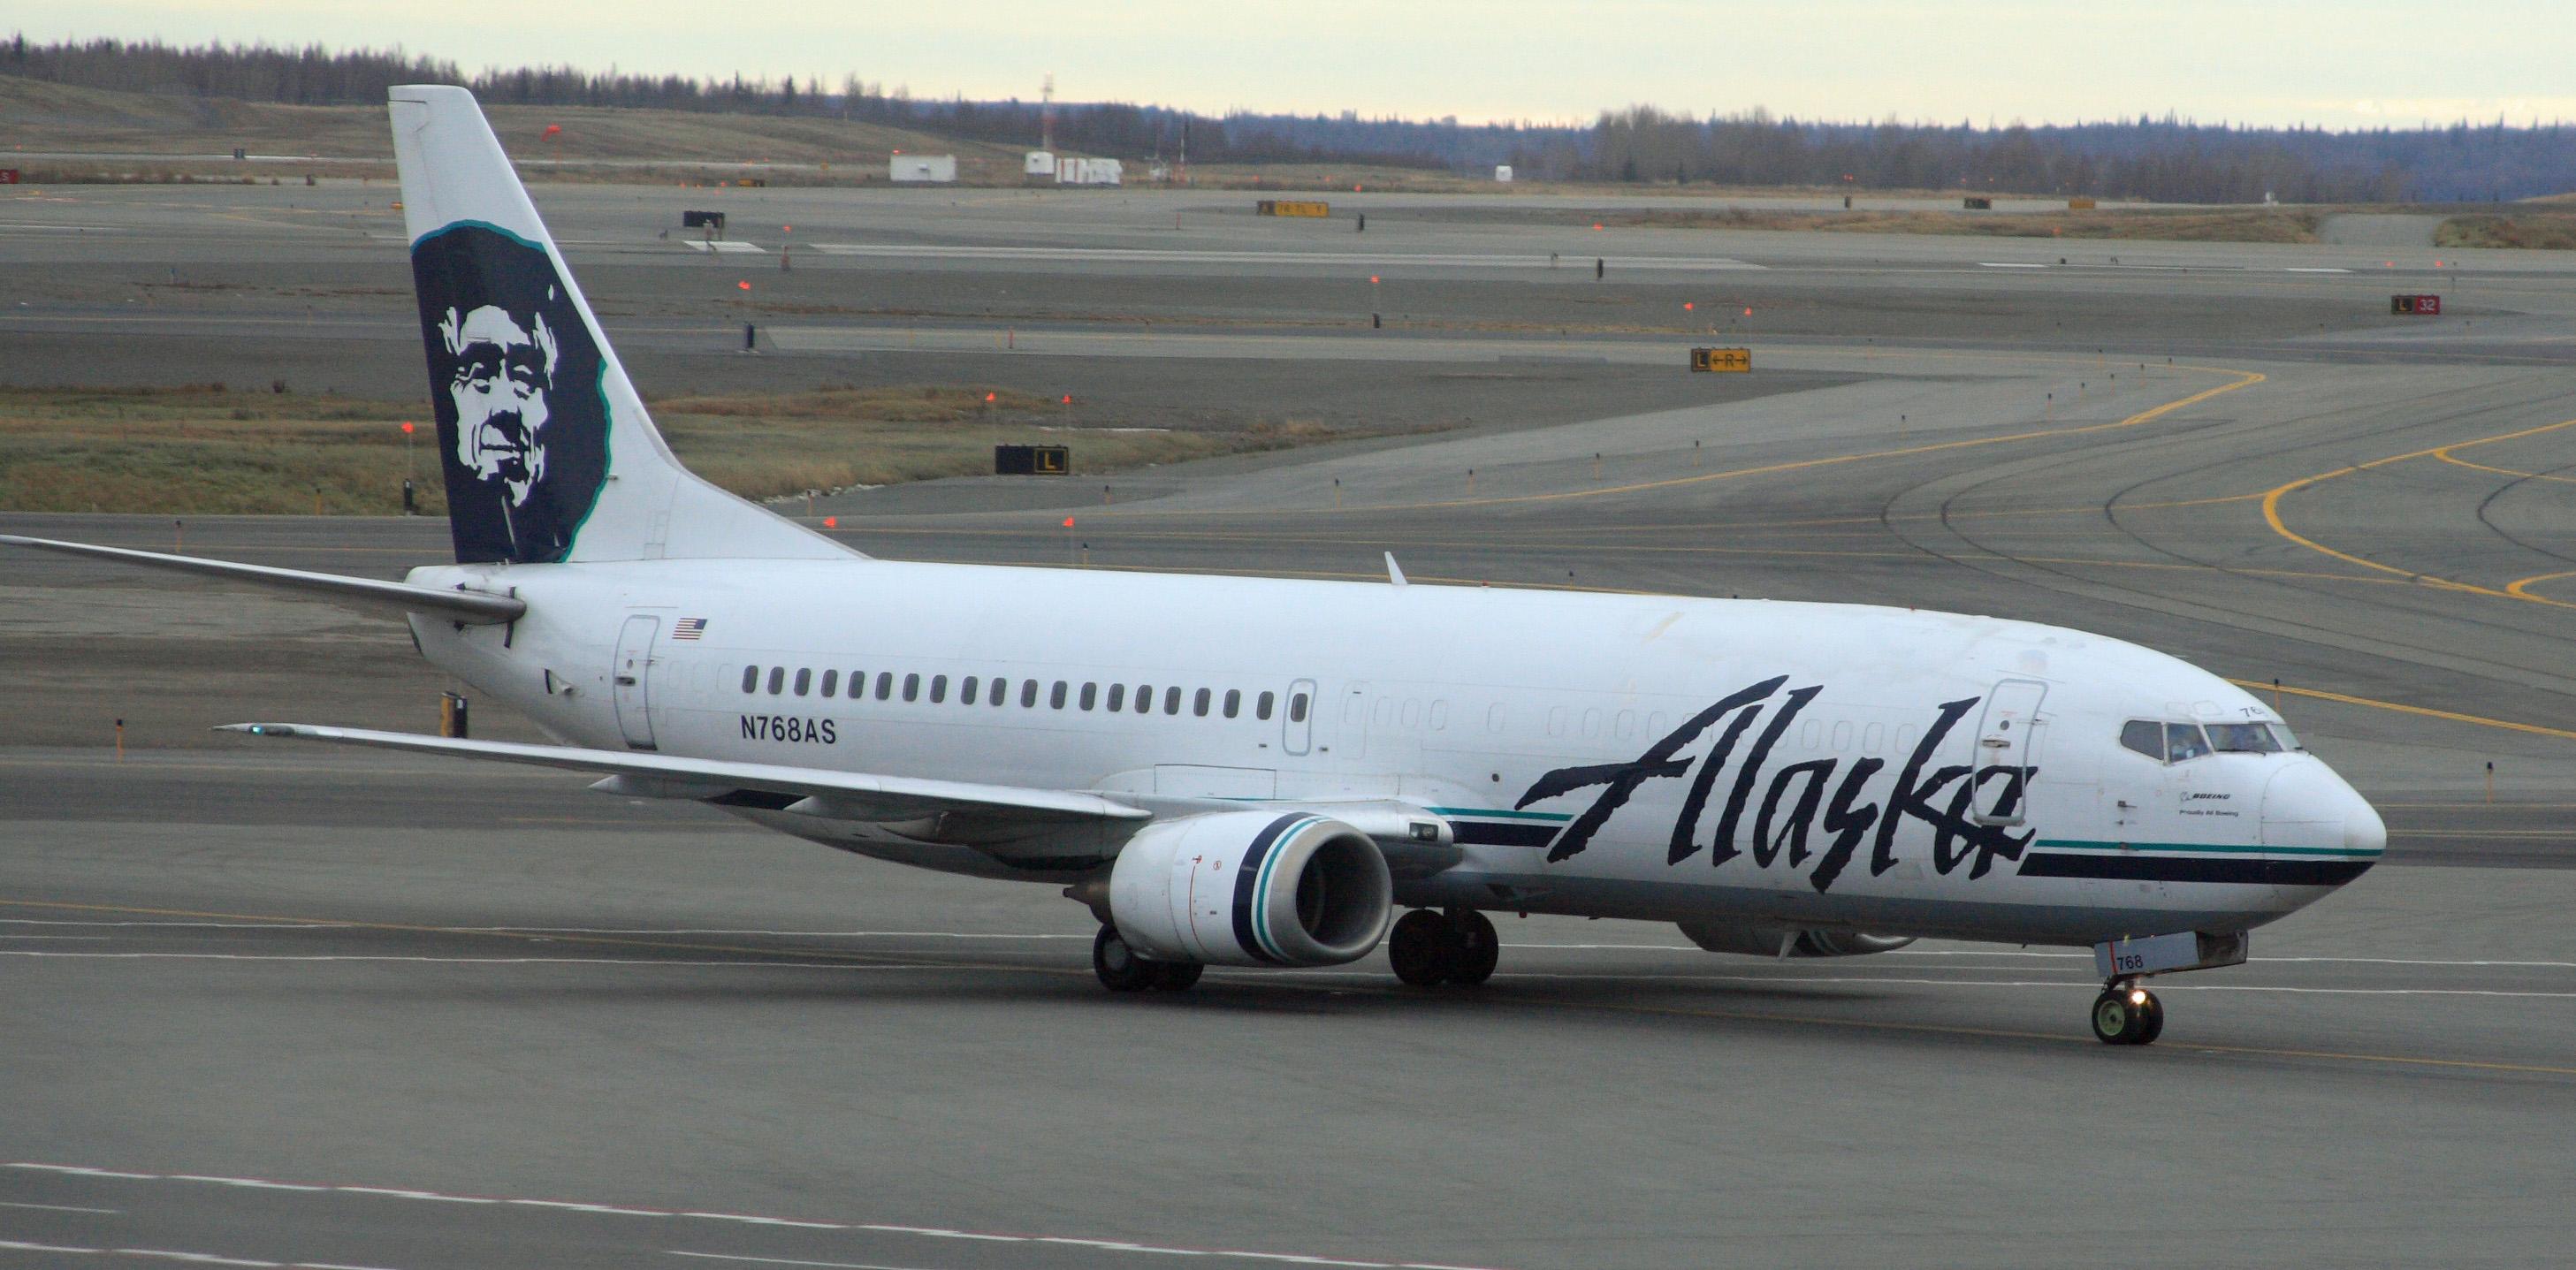 Https Www Alaskaair Com Content Cities Flights To New York